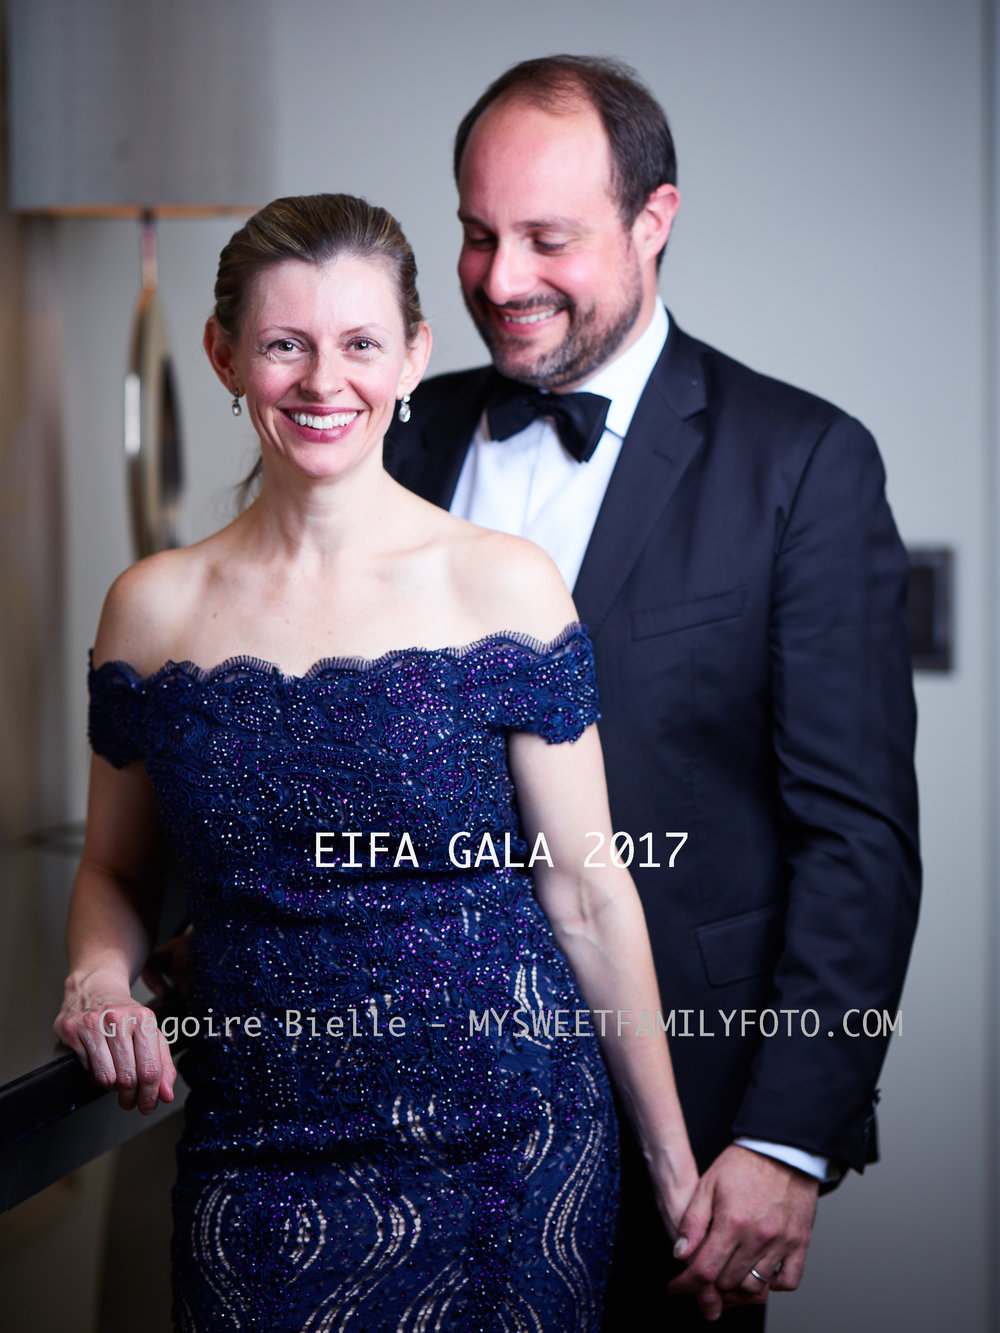 EIFA GALA 1151.jpg